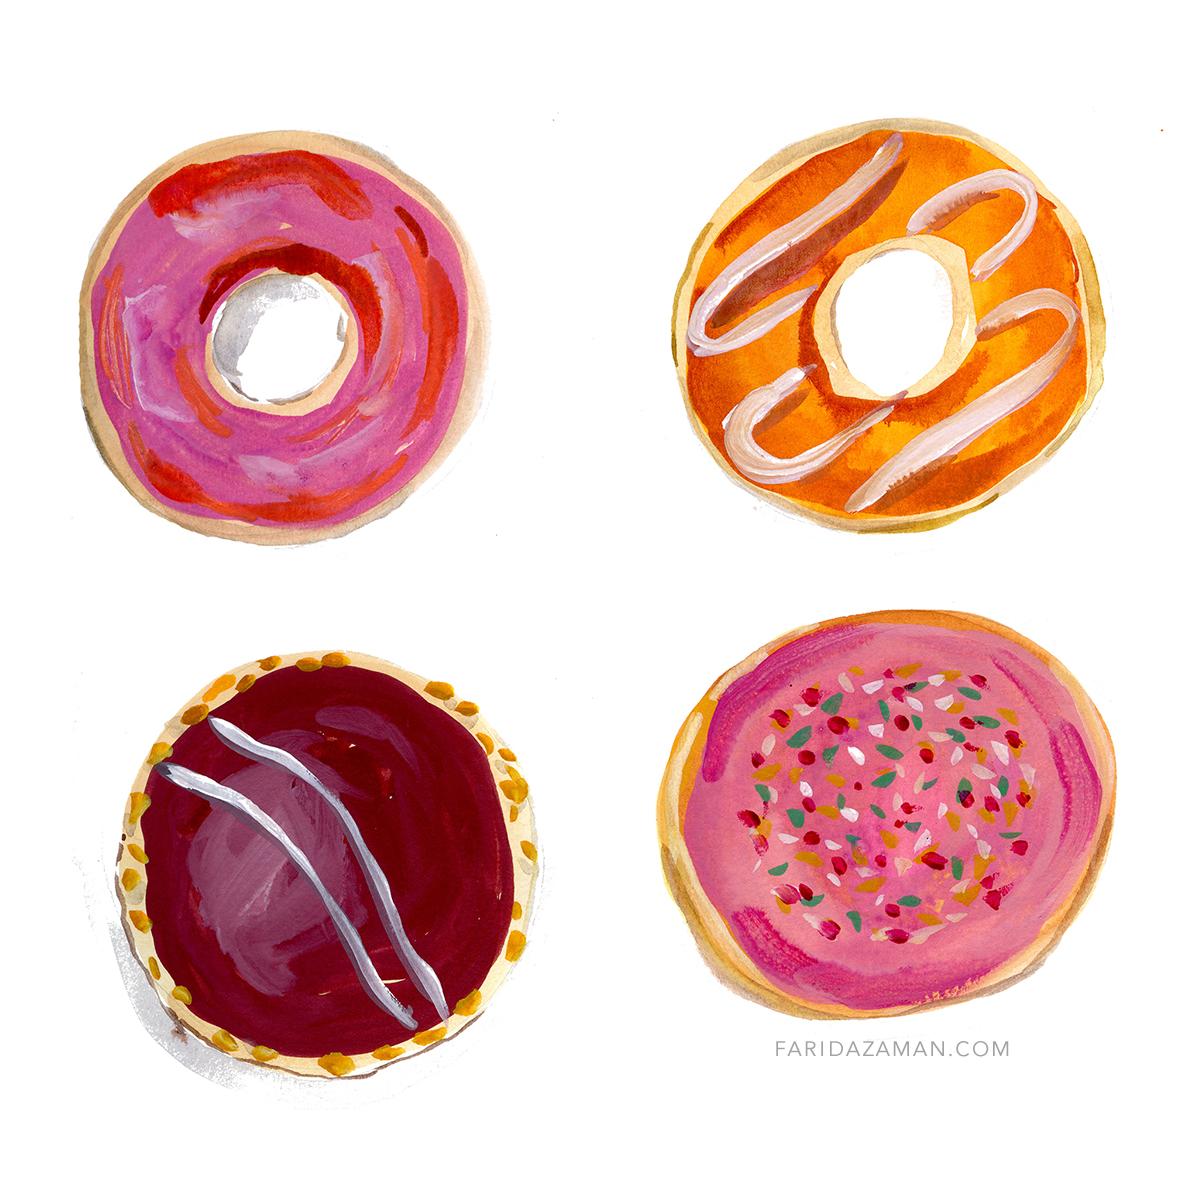 Donuts 150.jpg